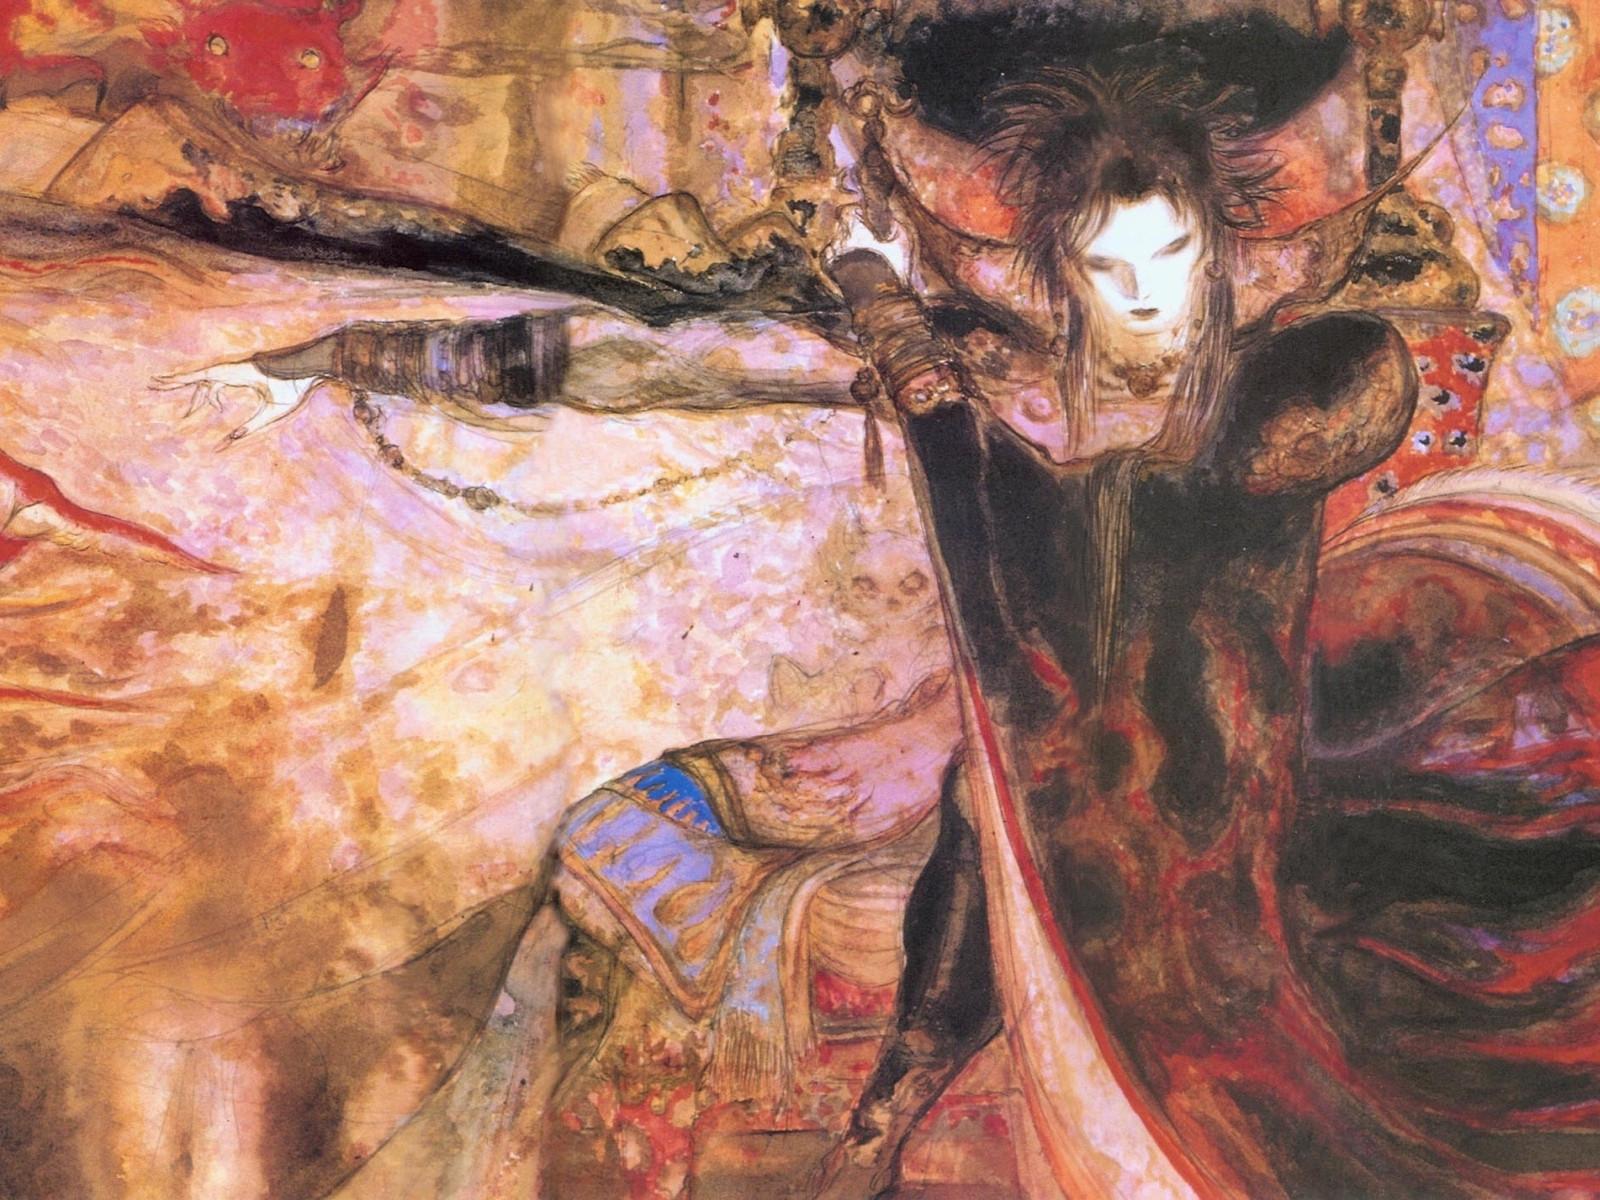 Manga Wallpapers